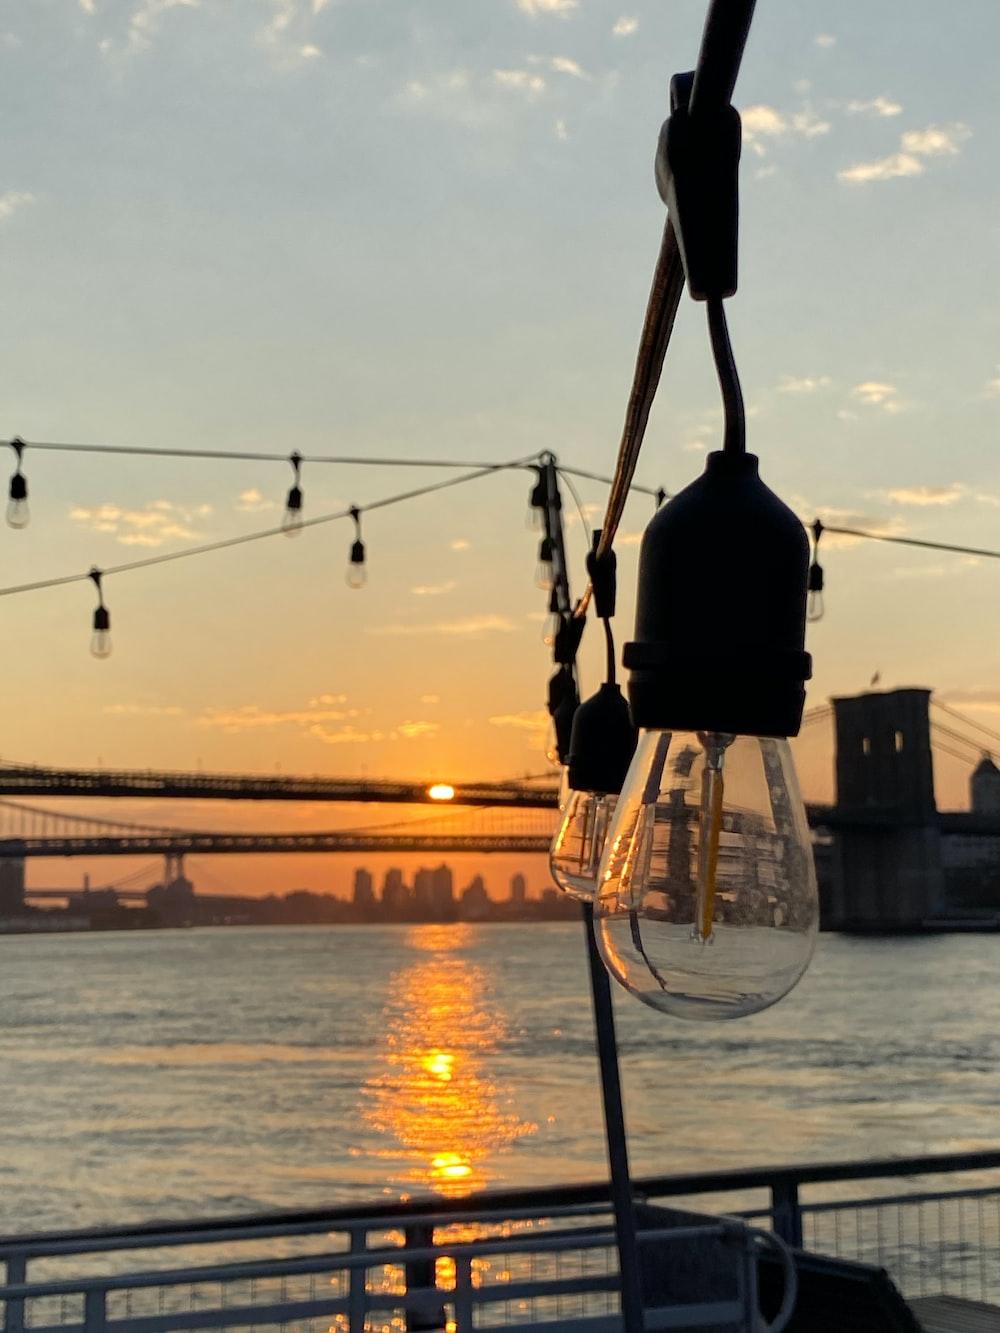 black light post near body of water during sunset